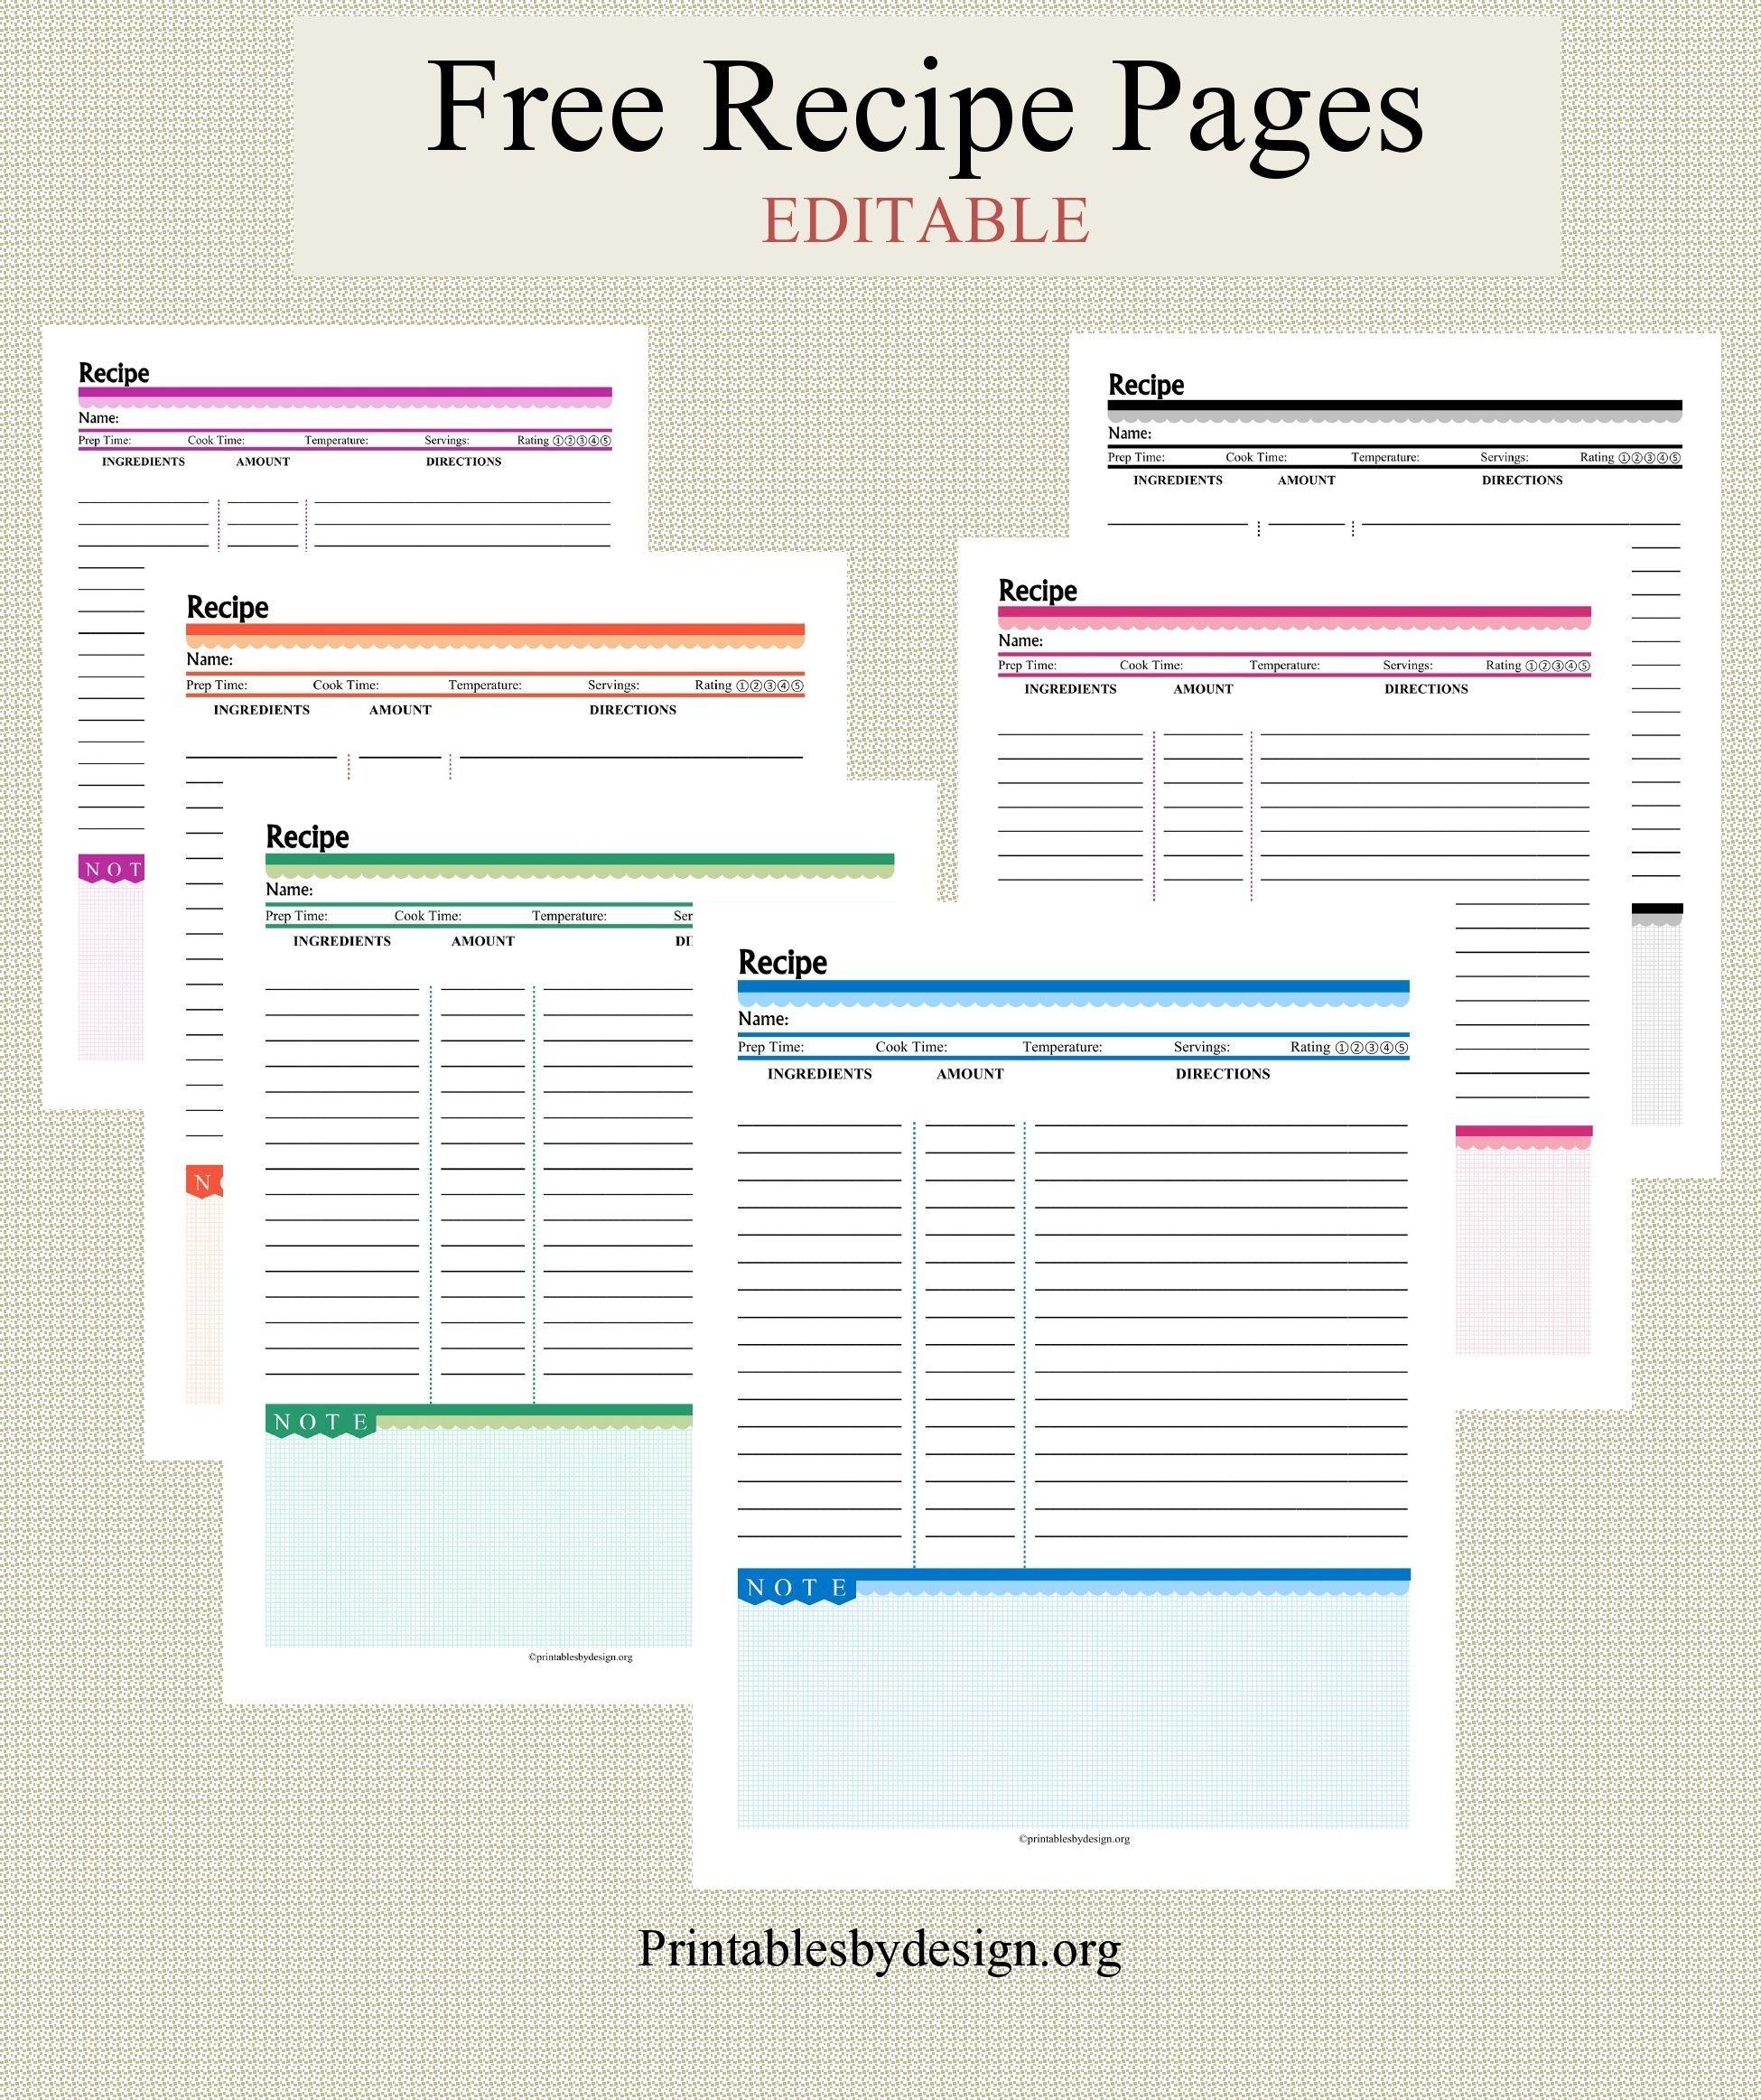 012 Free Recipe Book Template ~ Ulyssesroom | Fine. Food | Recipe - Free Printable Recipe Page Template